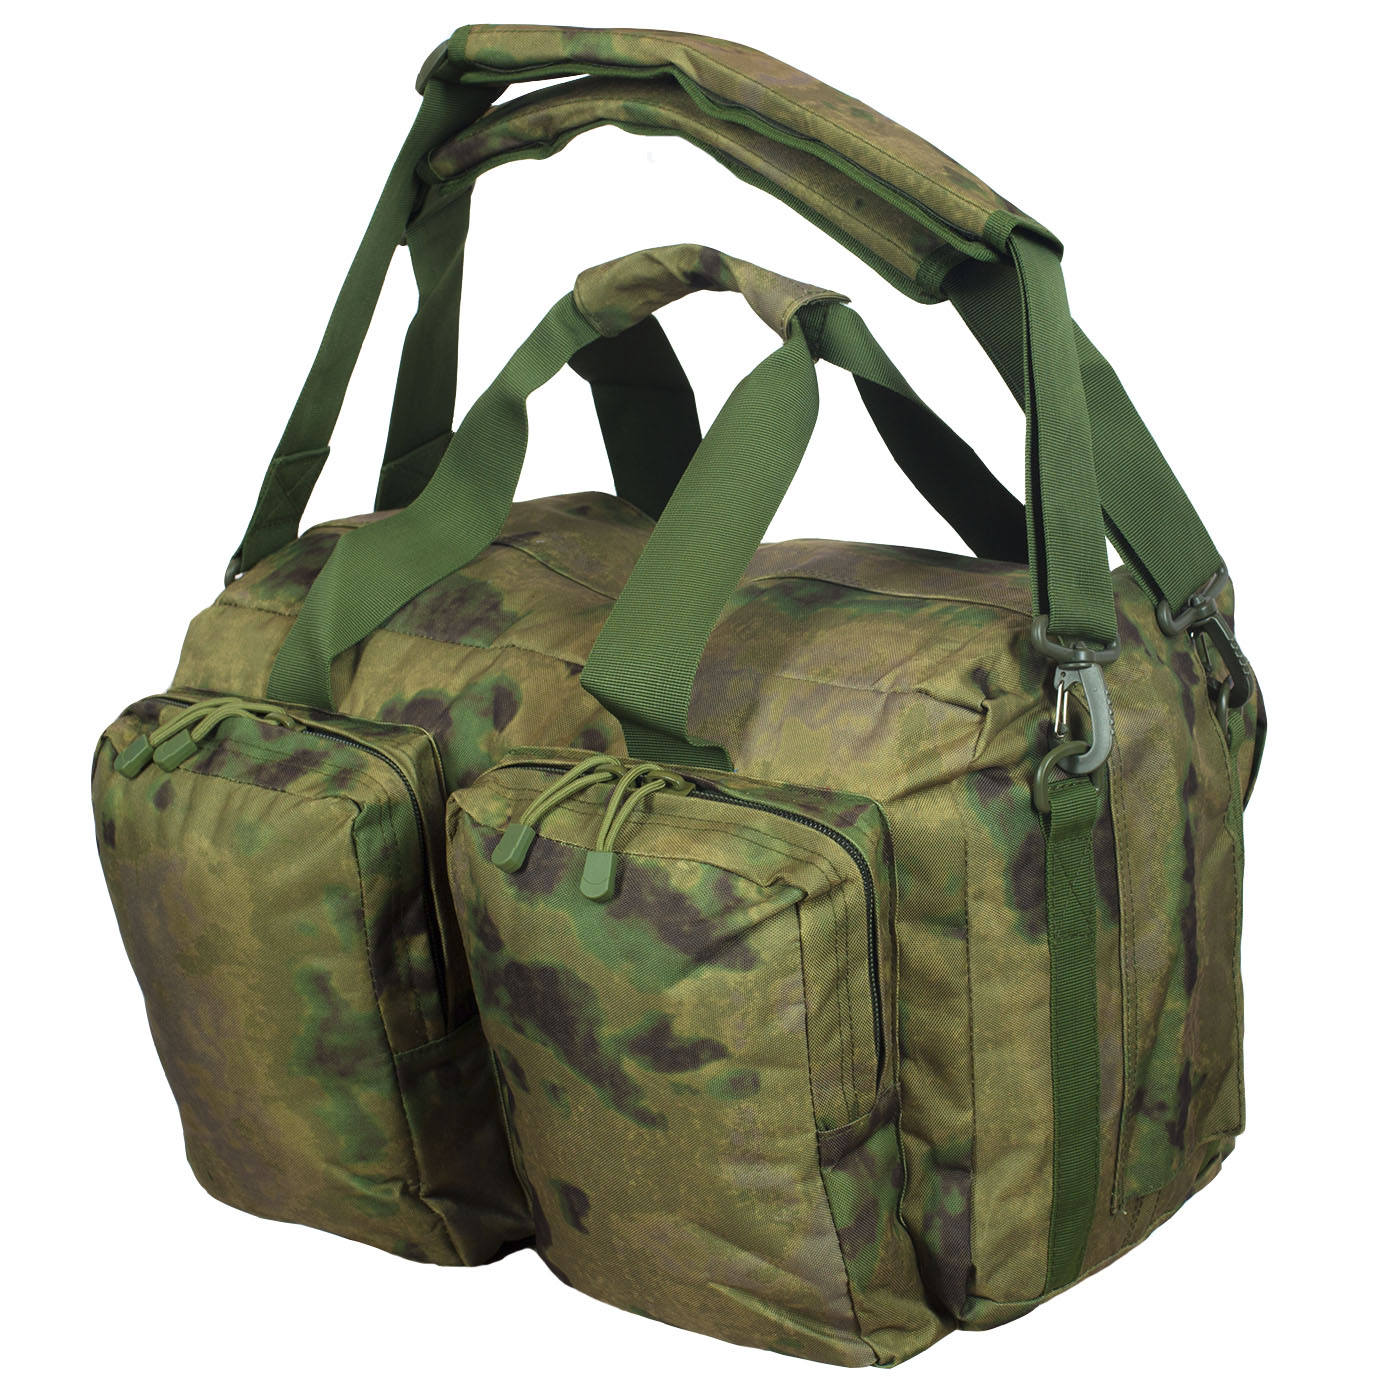 Камуфляжная заплечная сумка-баул Русская Охота - заказать с доставкой